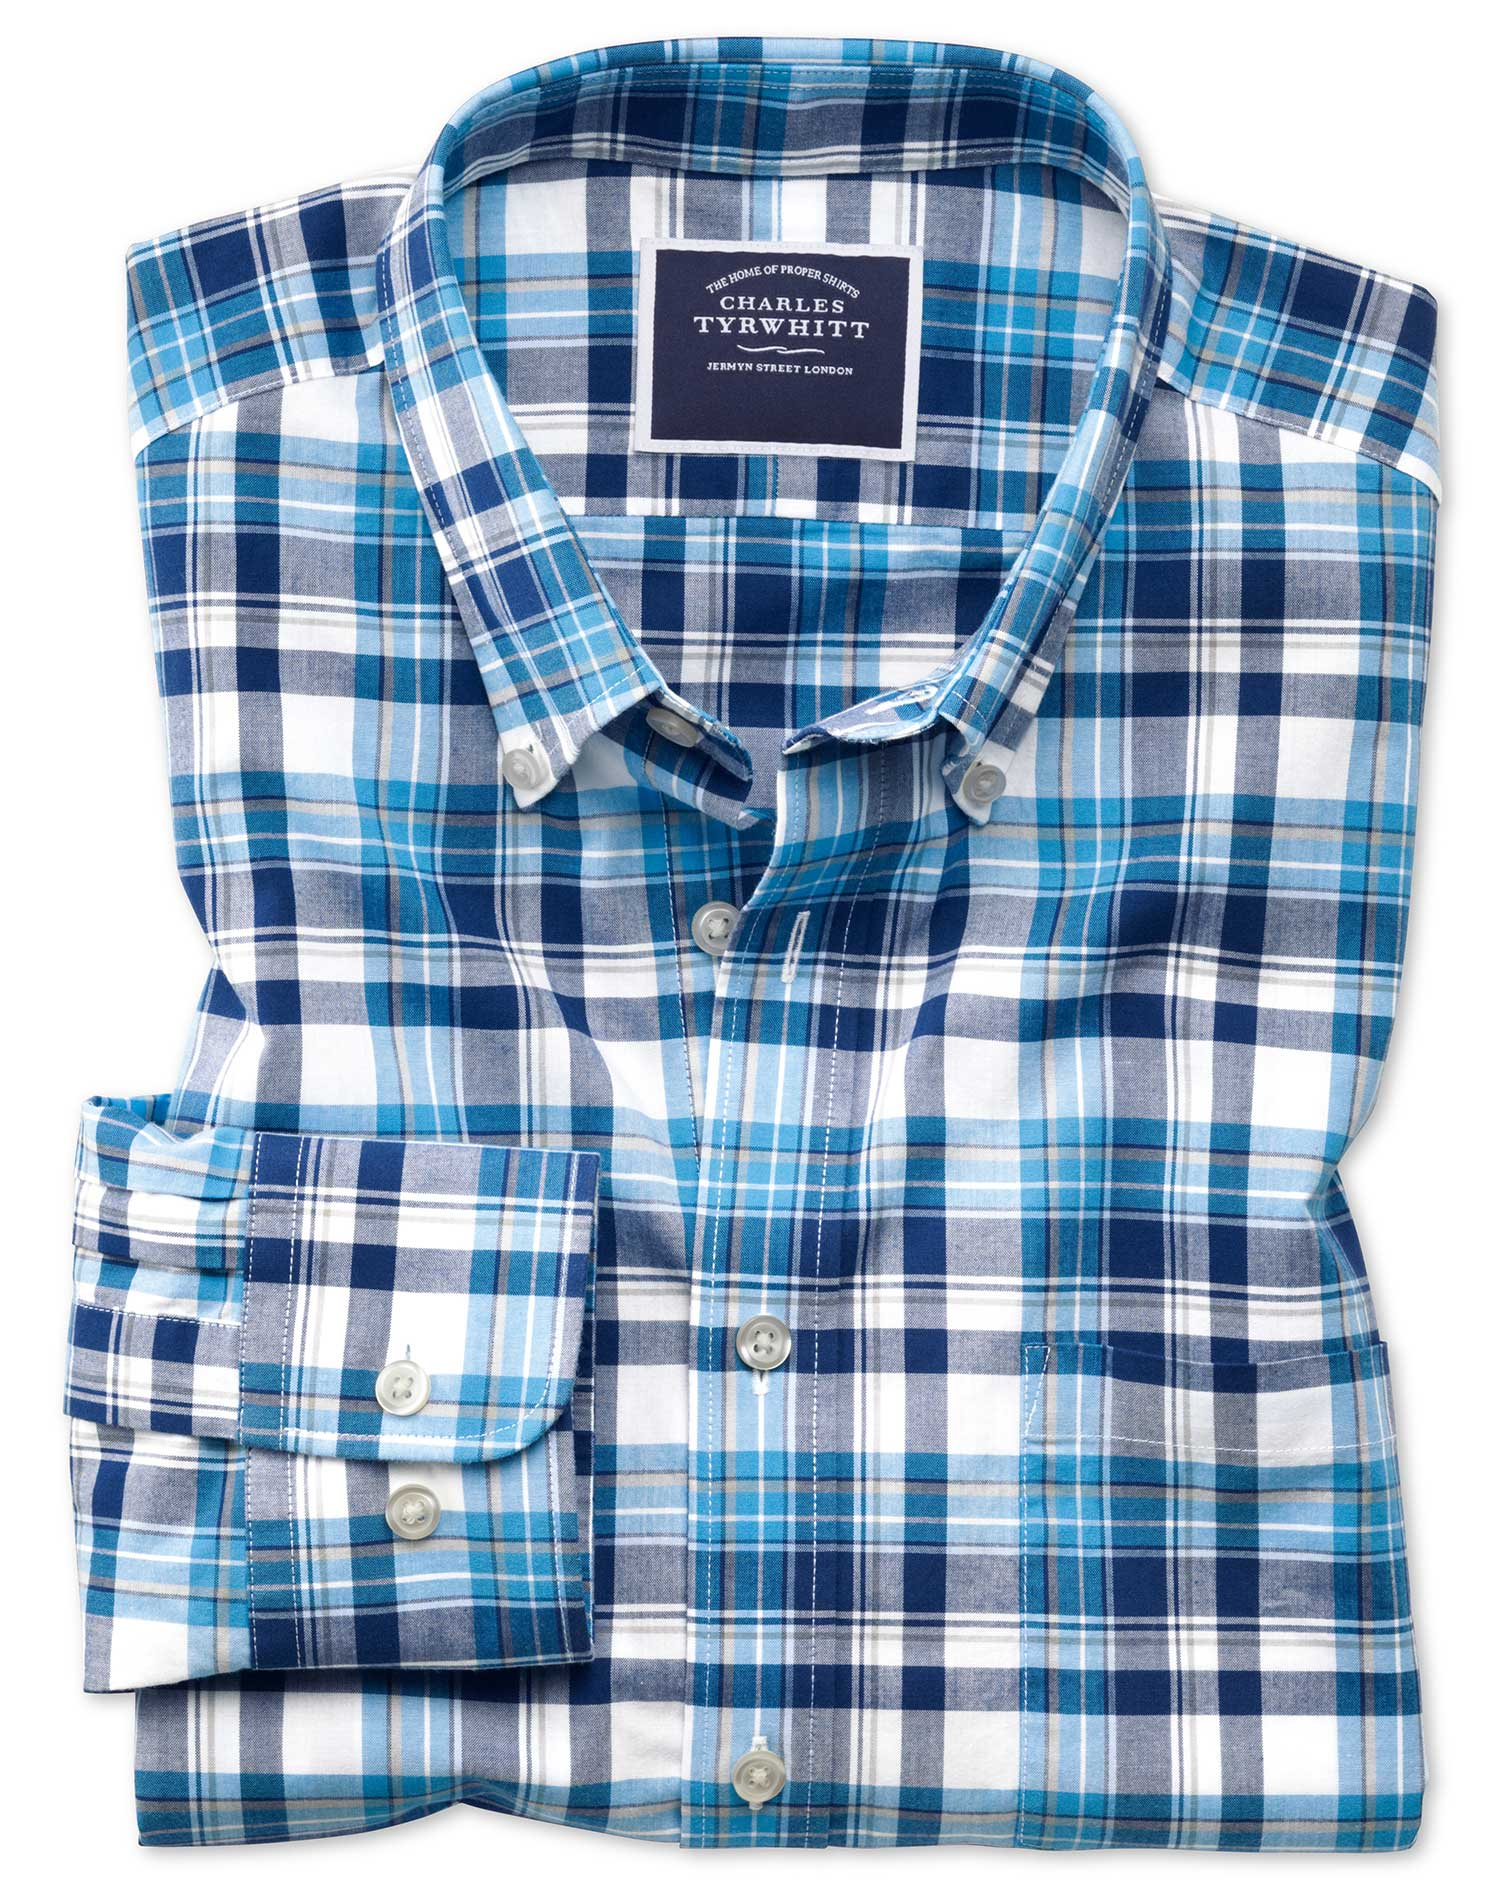 Classic Fit Poplin Navy Multi Cotton Shirt Single Cuff Size XXXL by Charles Tyrwhitt